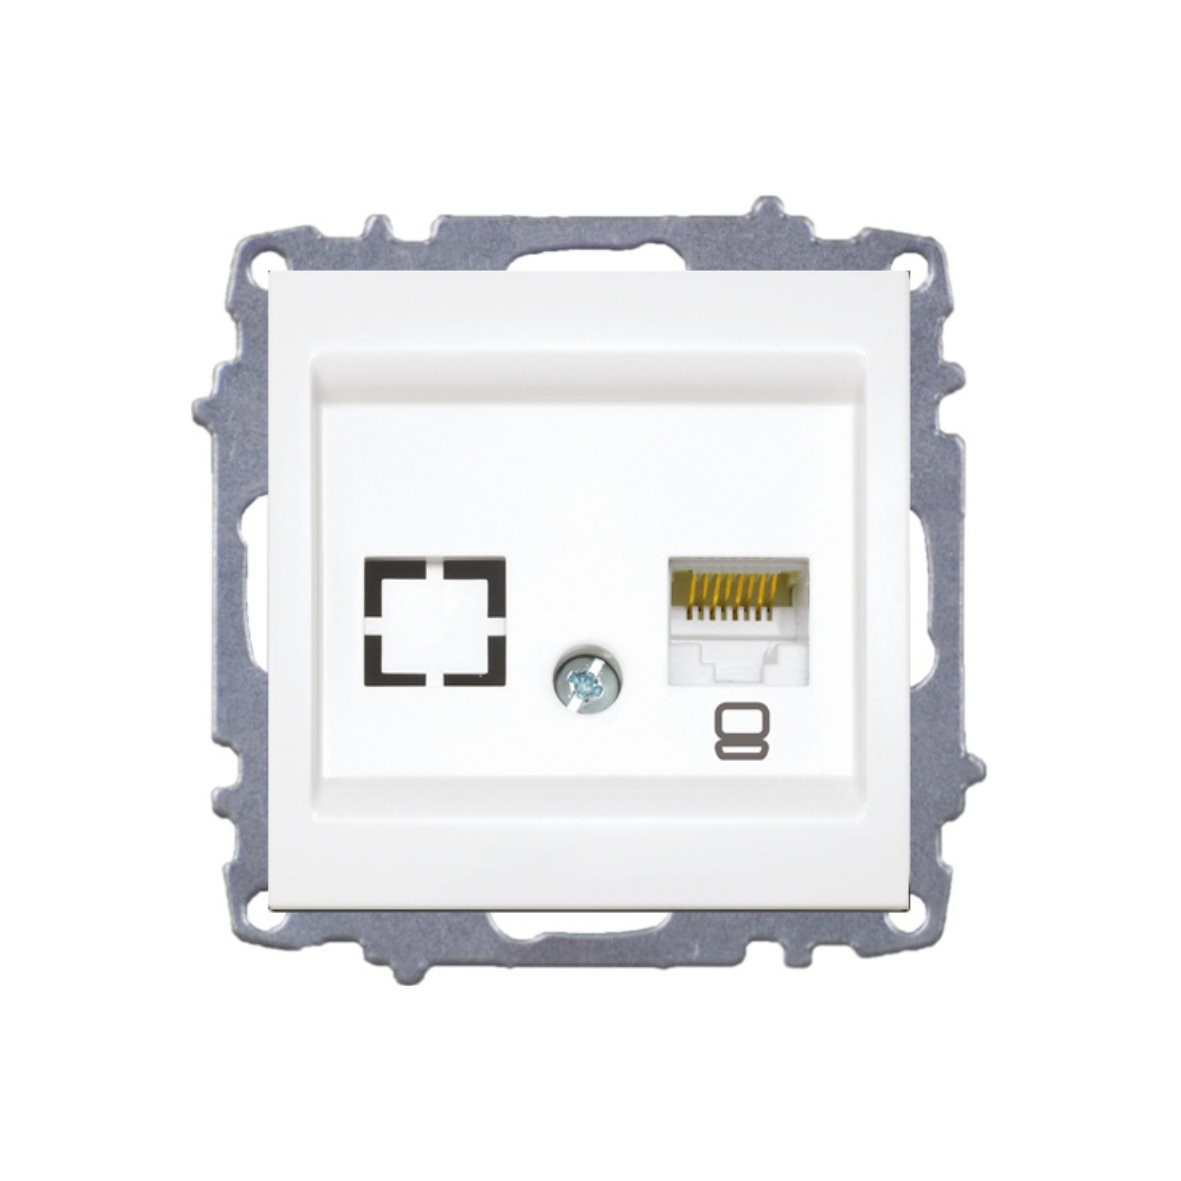 Изображение ZENA модуль вишня Розетка компьютерная /1раз Е6/